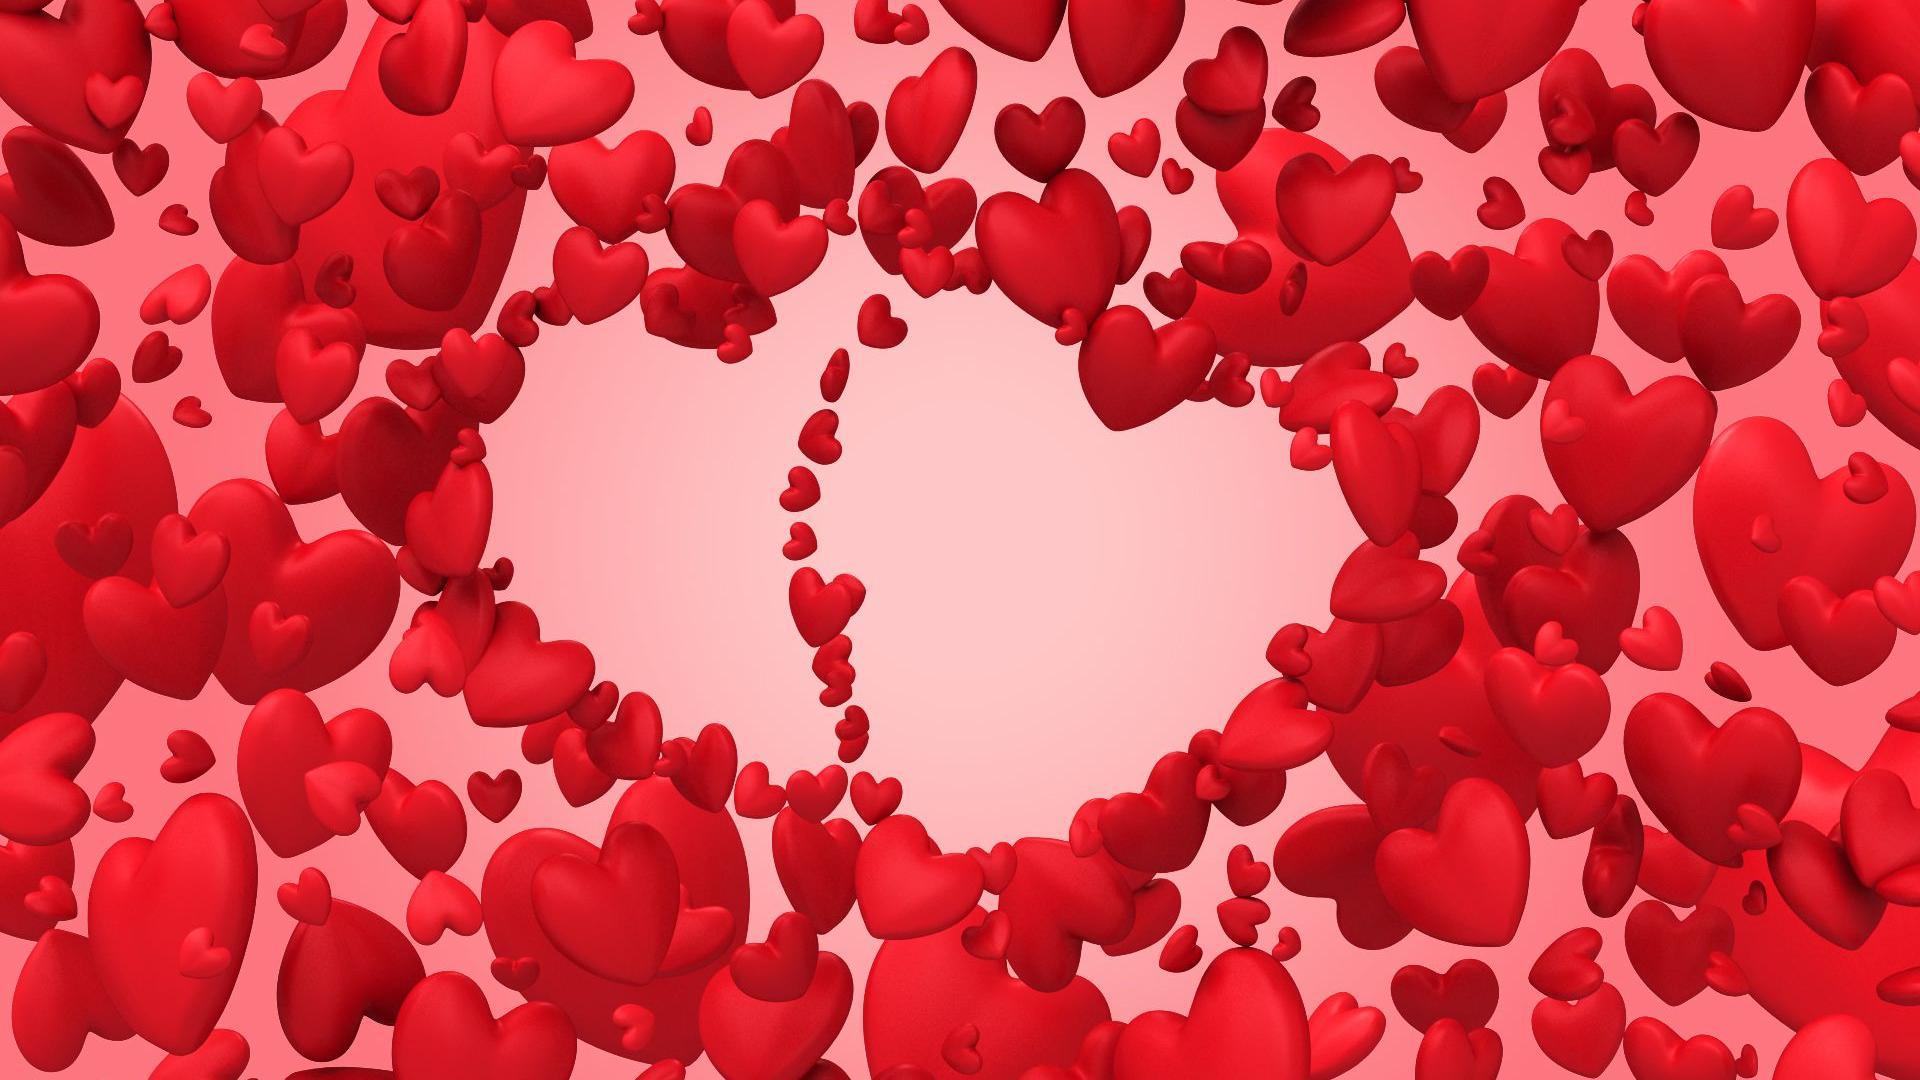 heart background hd